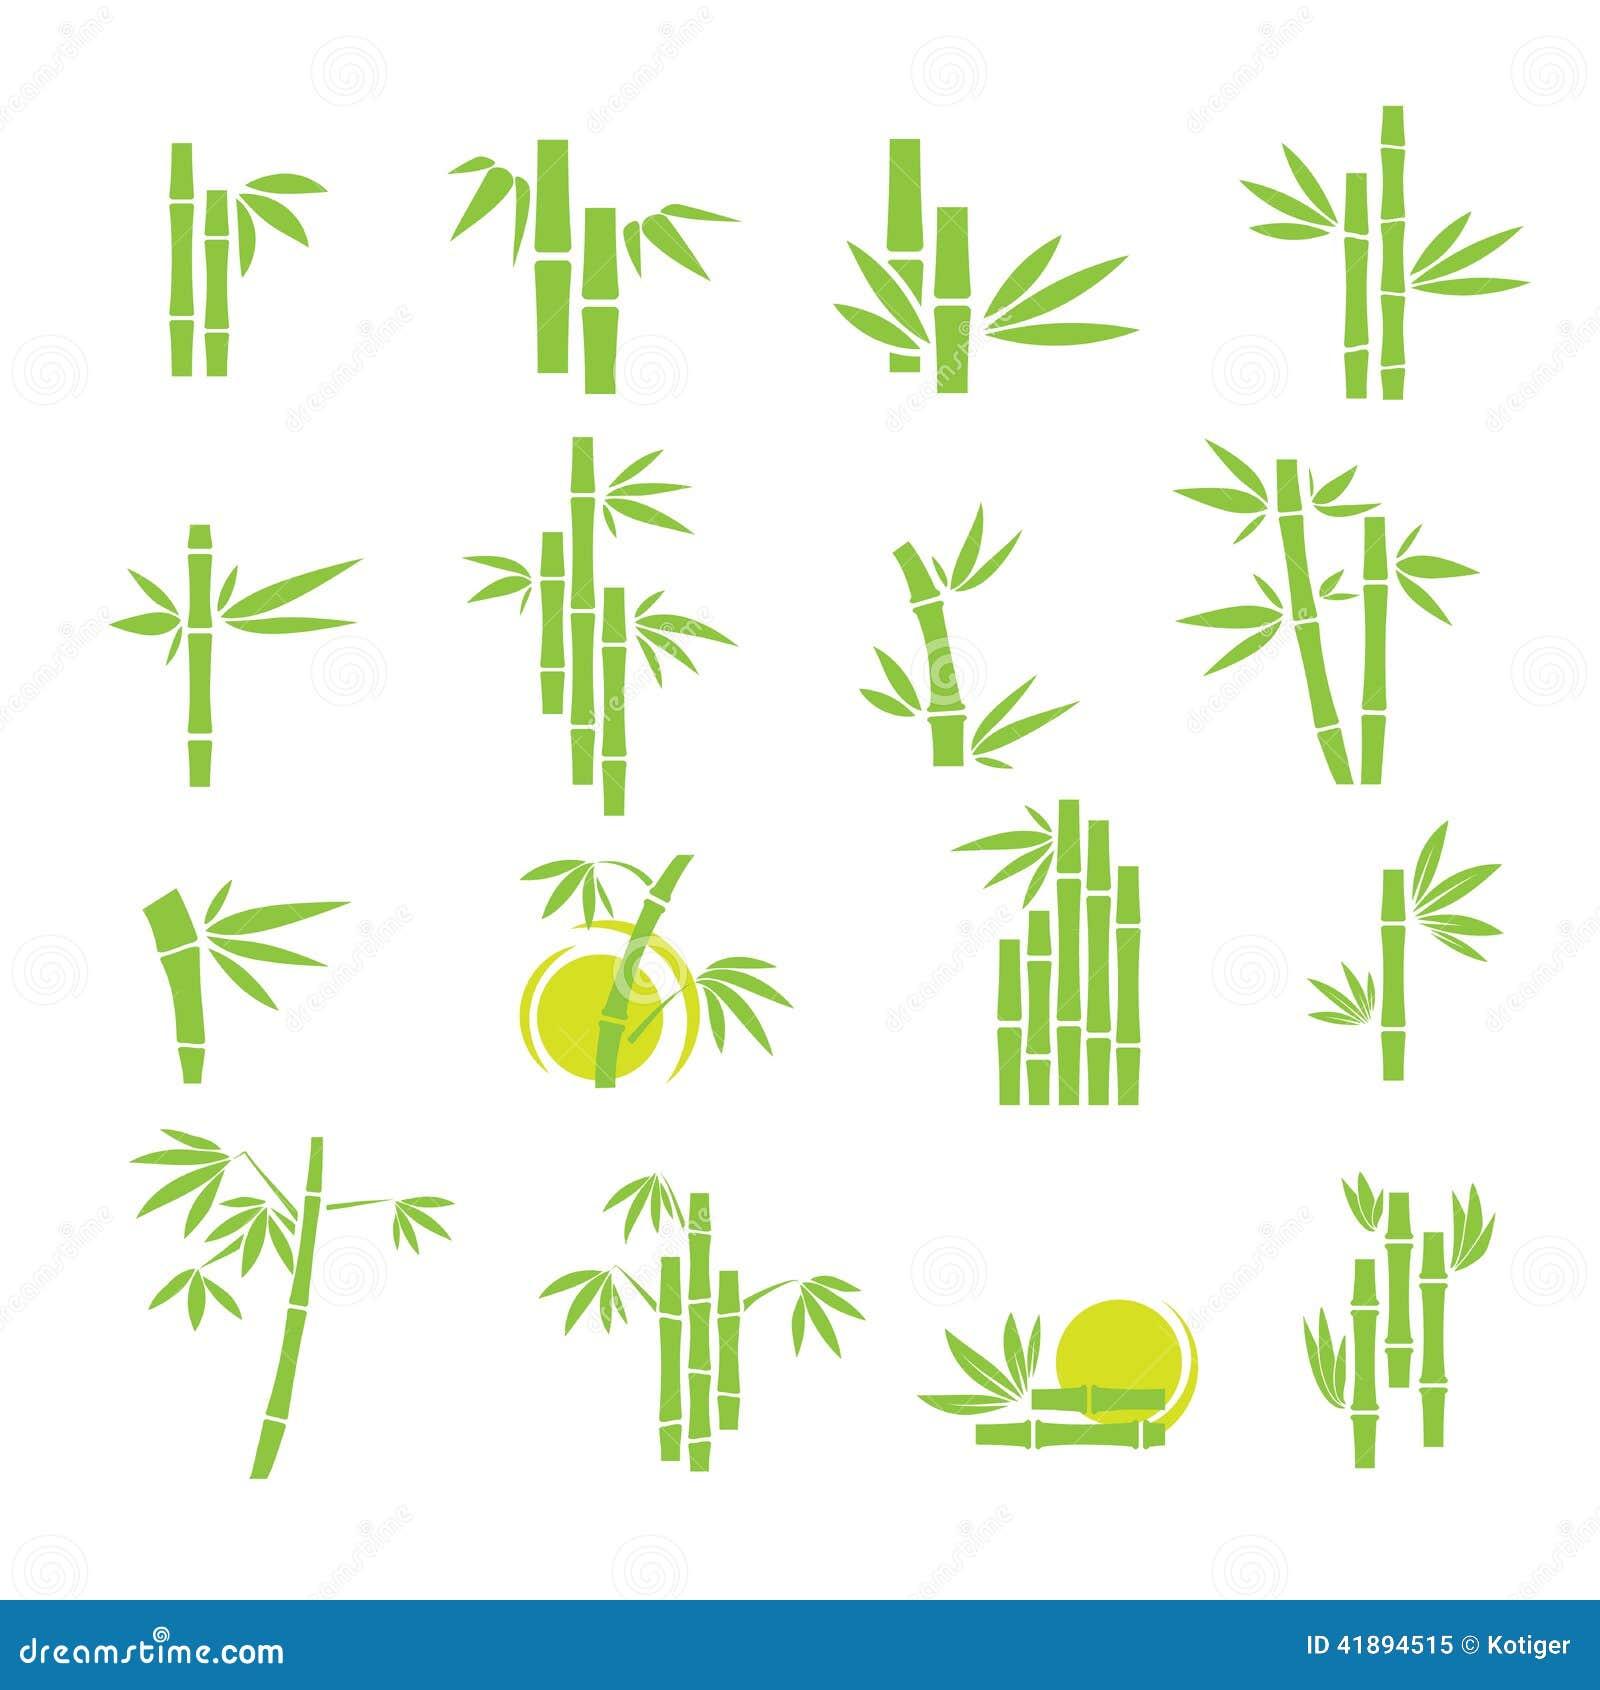 Bamboo Vector Symbol Icons Set Stock Vector Image 41894515